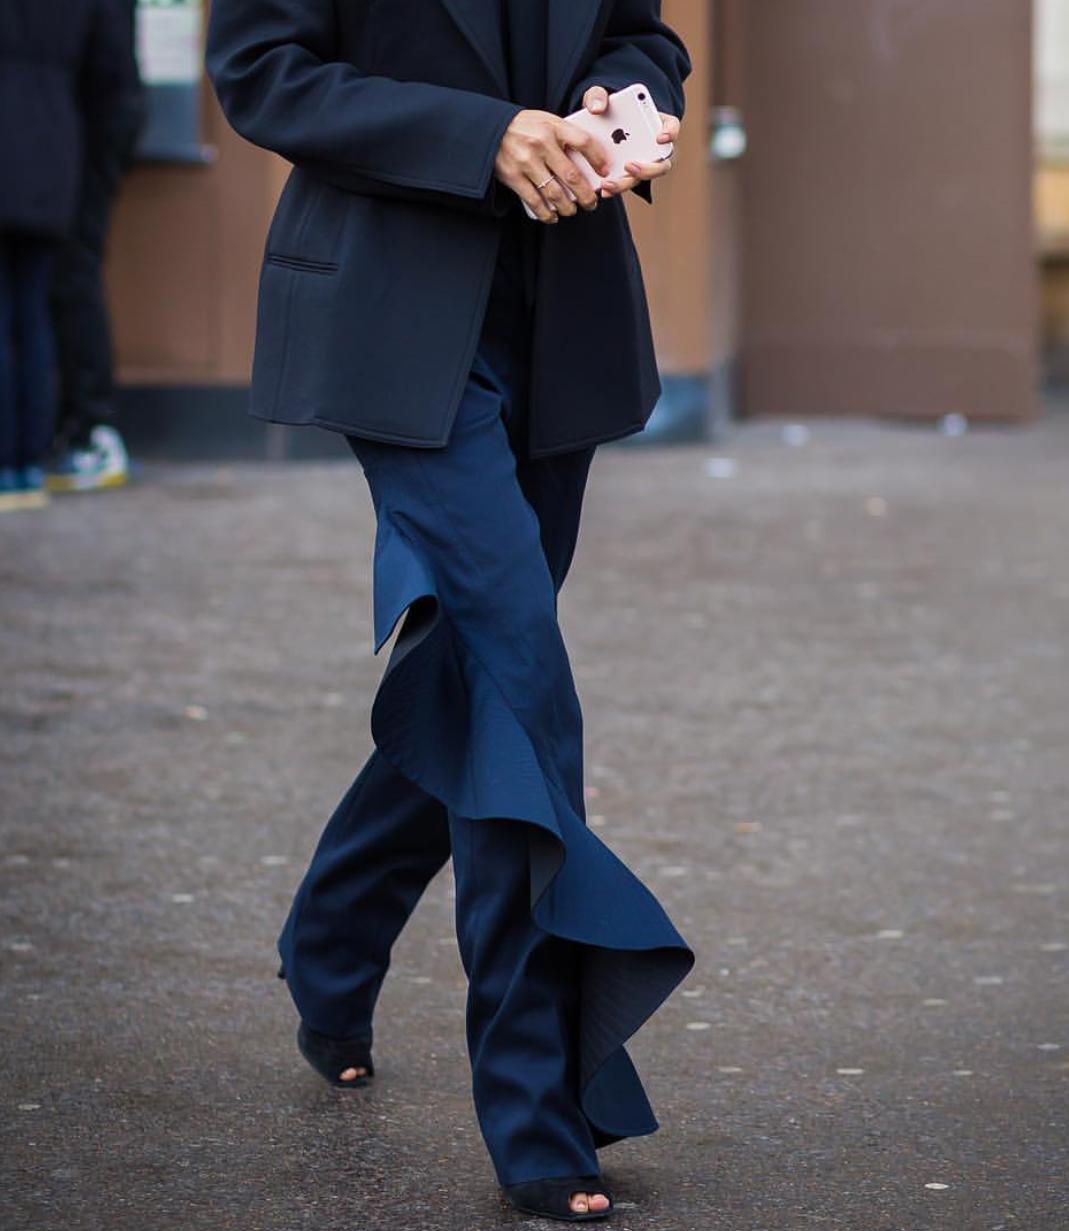 мода для женщин за 50 в 2019 году весна лето: синие брюки с воланами